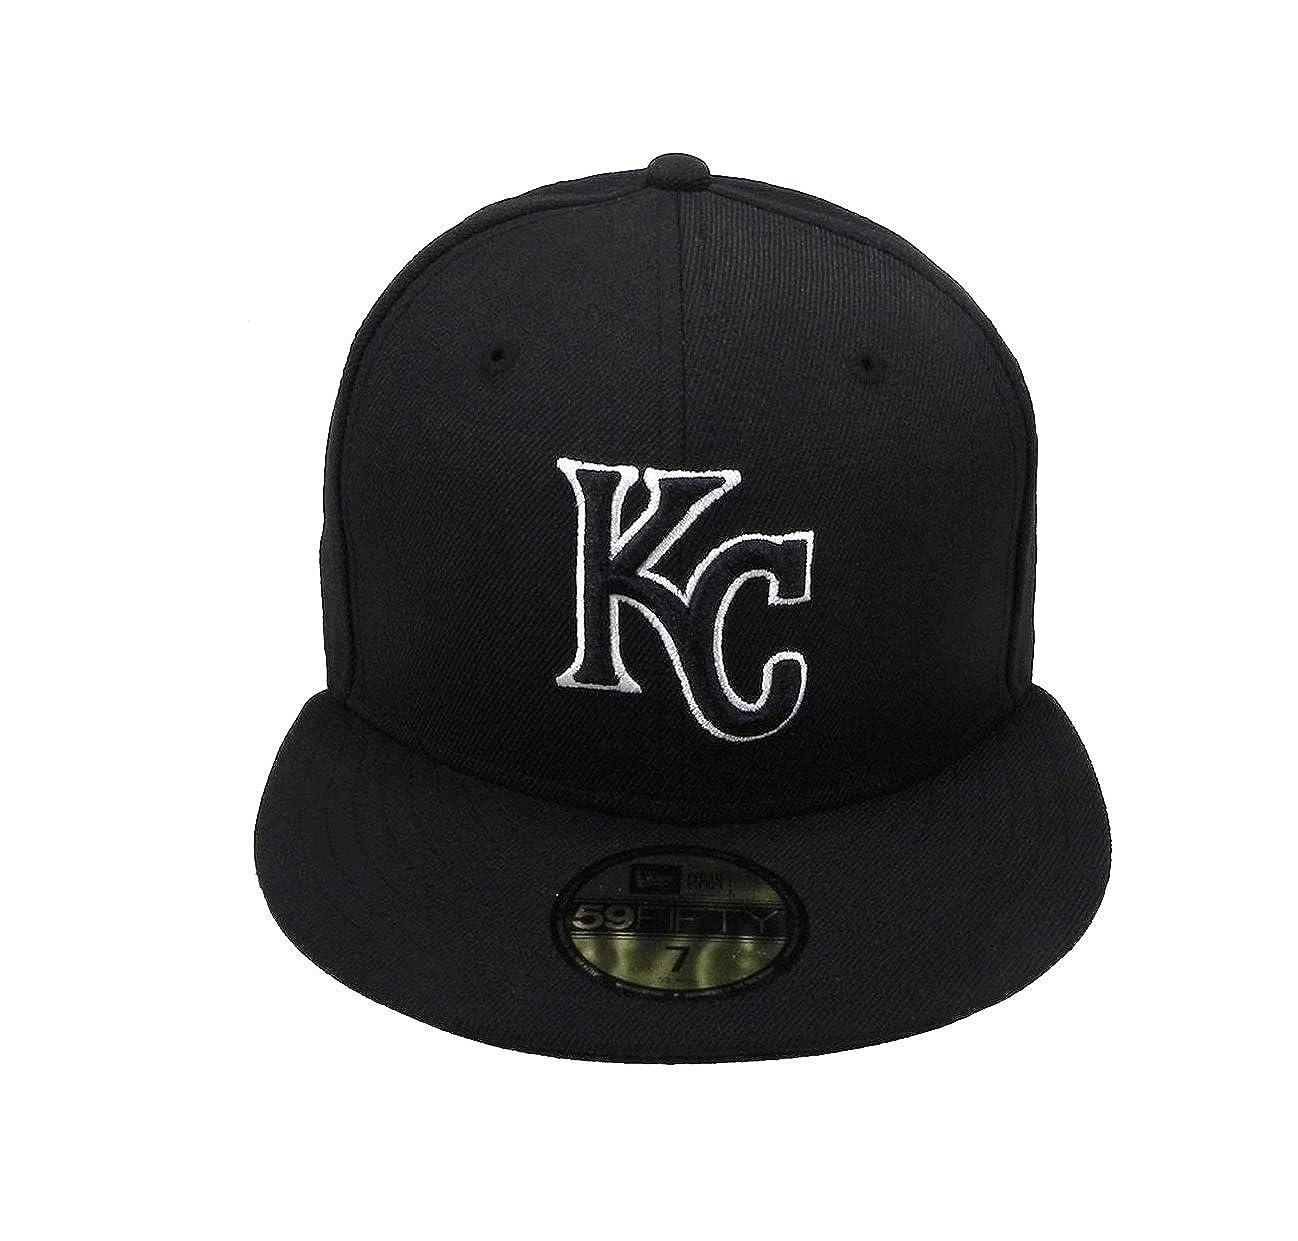 de847d3b New Era 59Fifty Hat MLB Kansas City Royals Black/White Fitted Headwear Cap